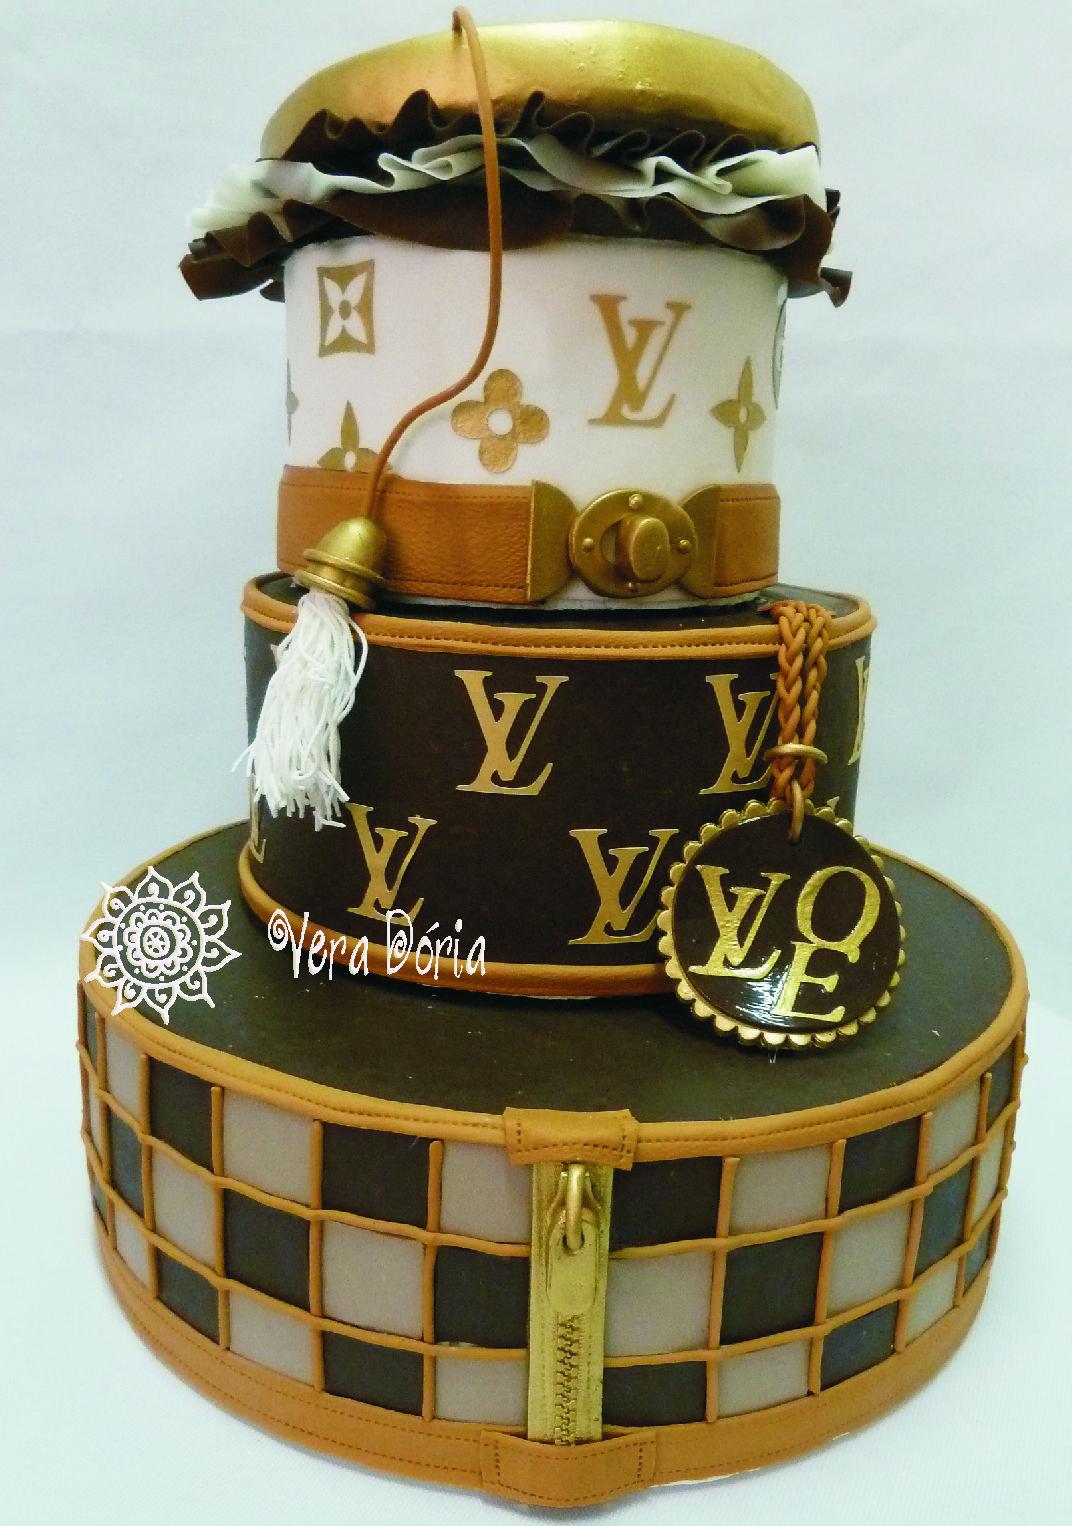 Cake inspired by my favorite designer Gucci gucci gucci cake